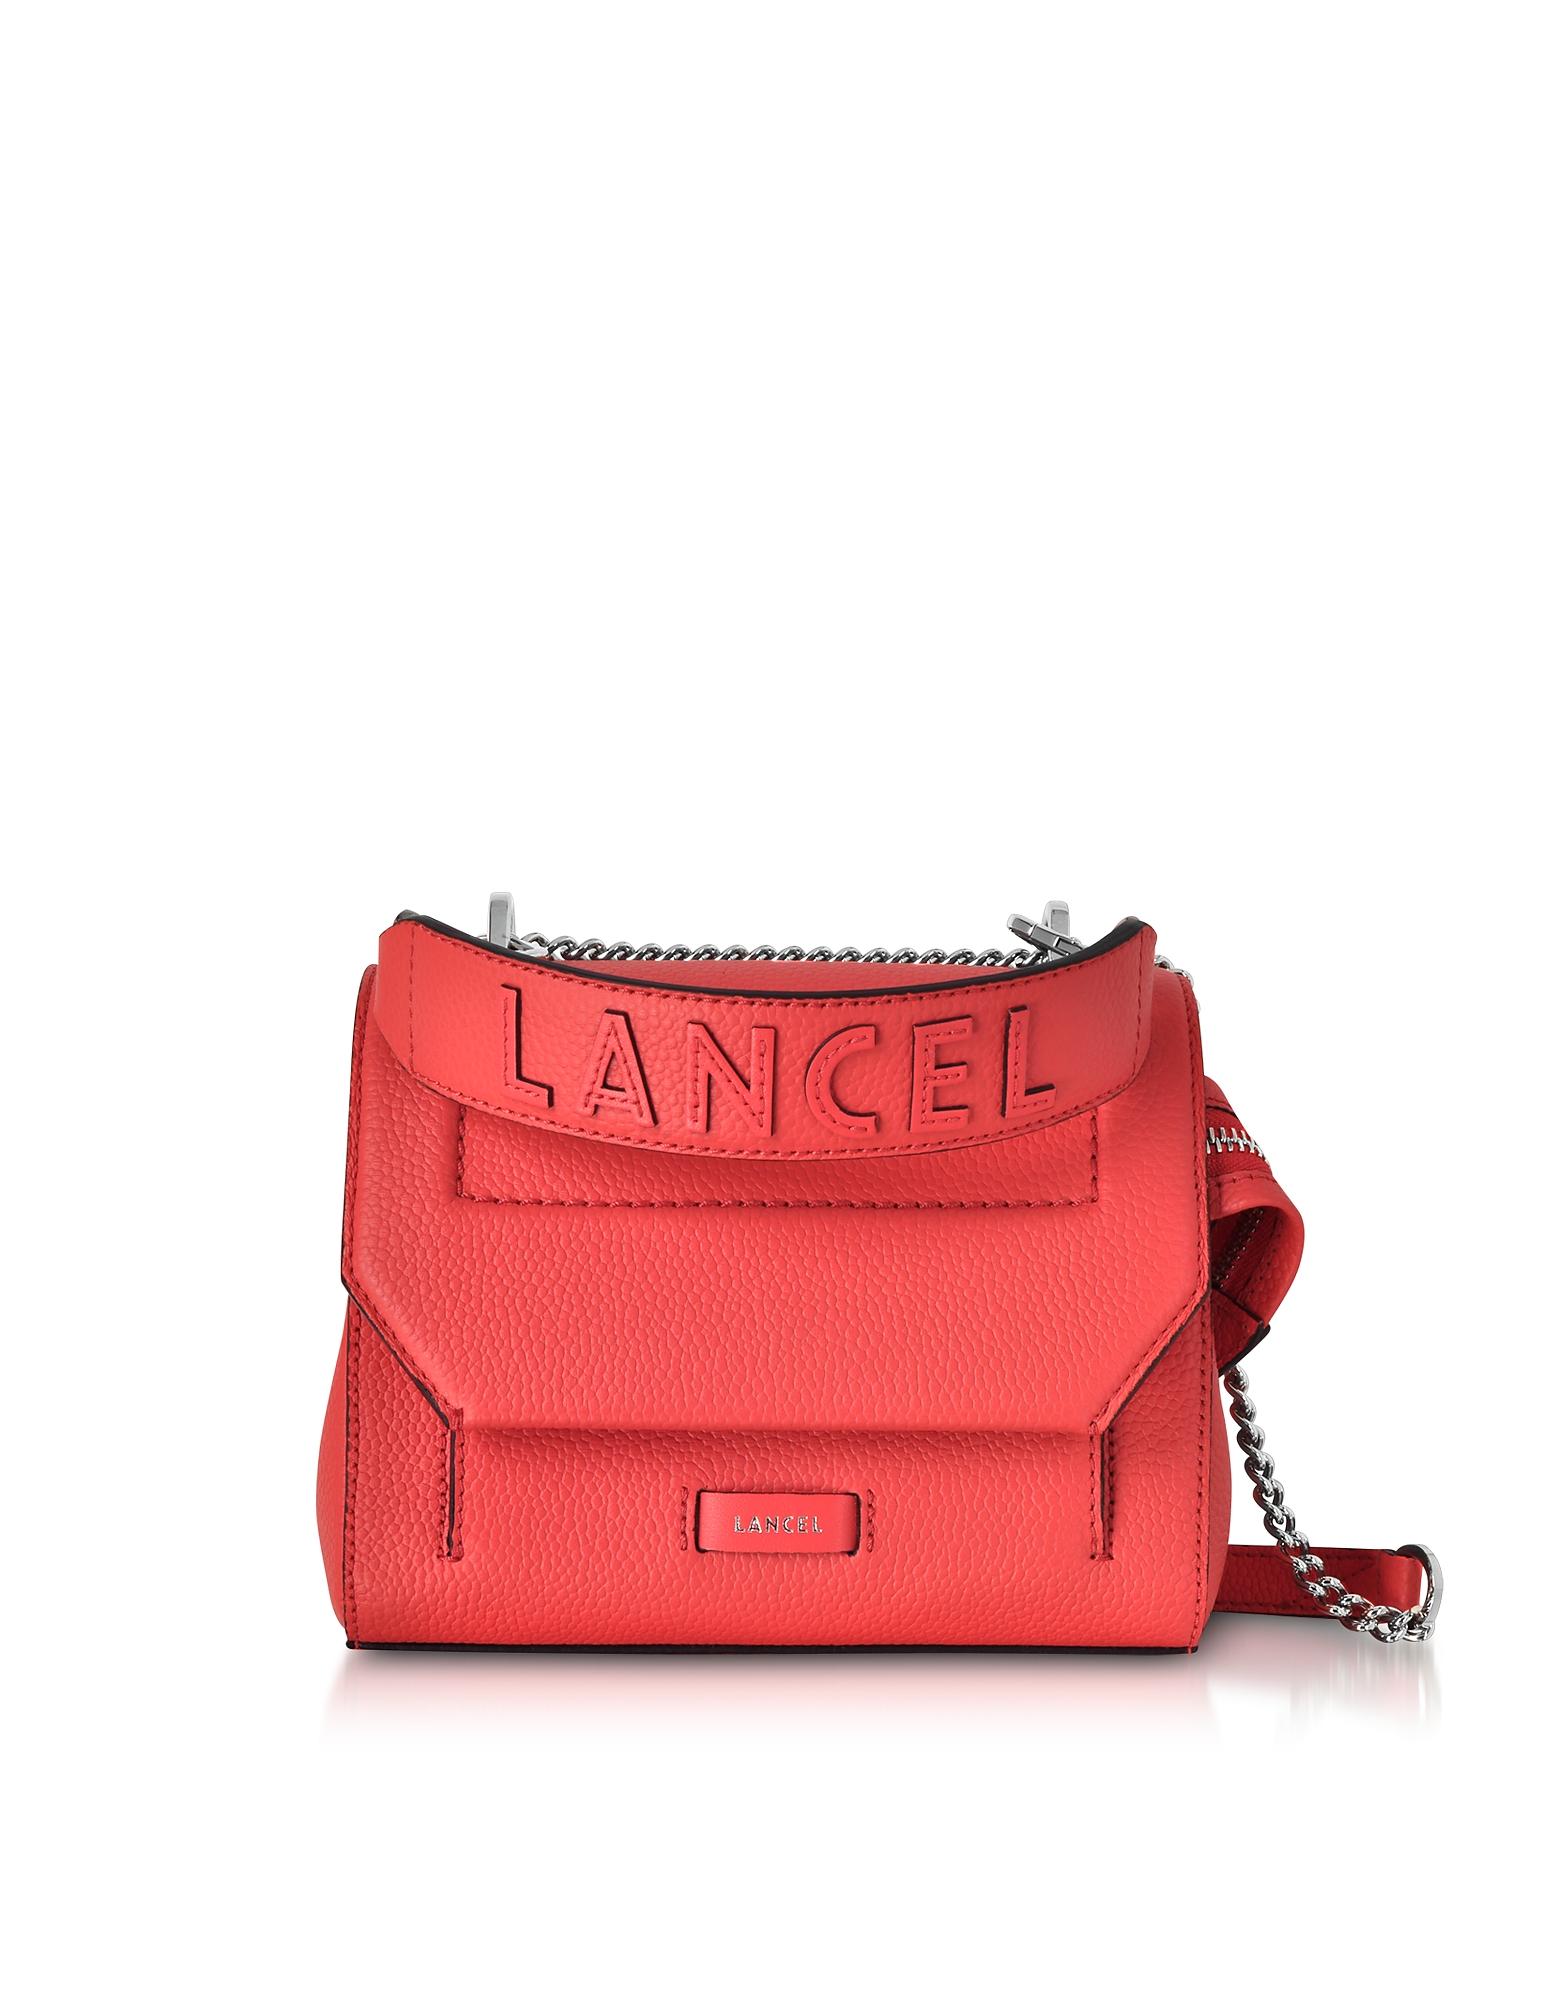 Image of Lancel Designer Handbags, Coral Ninon Round Leather Small Flap Bag